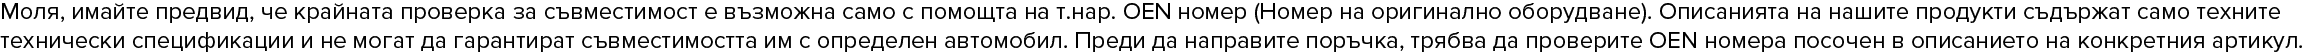 SKF VKJML 01001, VKJML 01002, VKN 400, VKN 402 Комплект маншон, полуоска